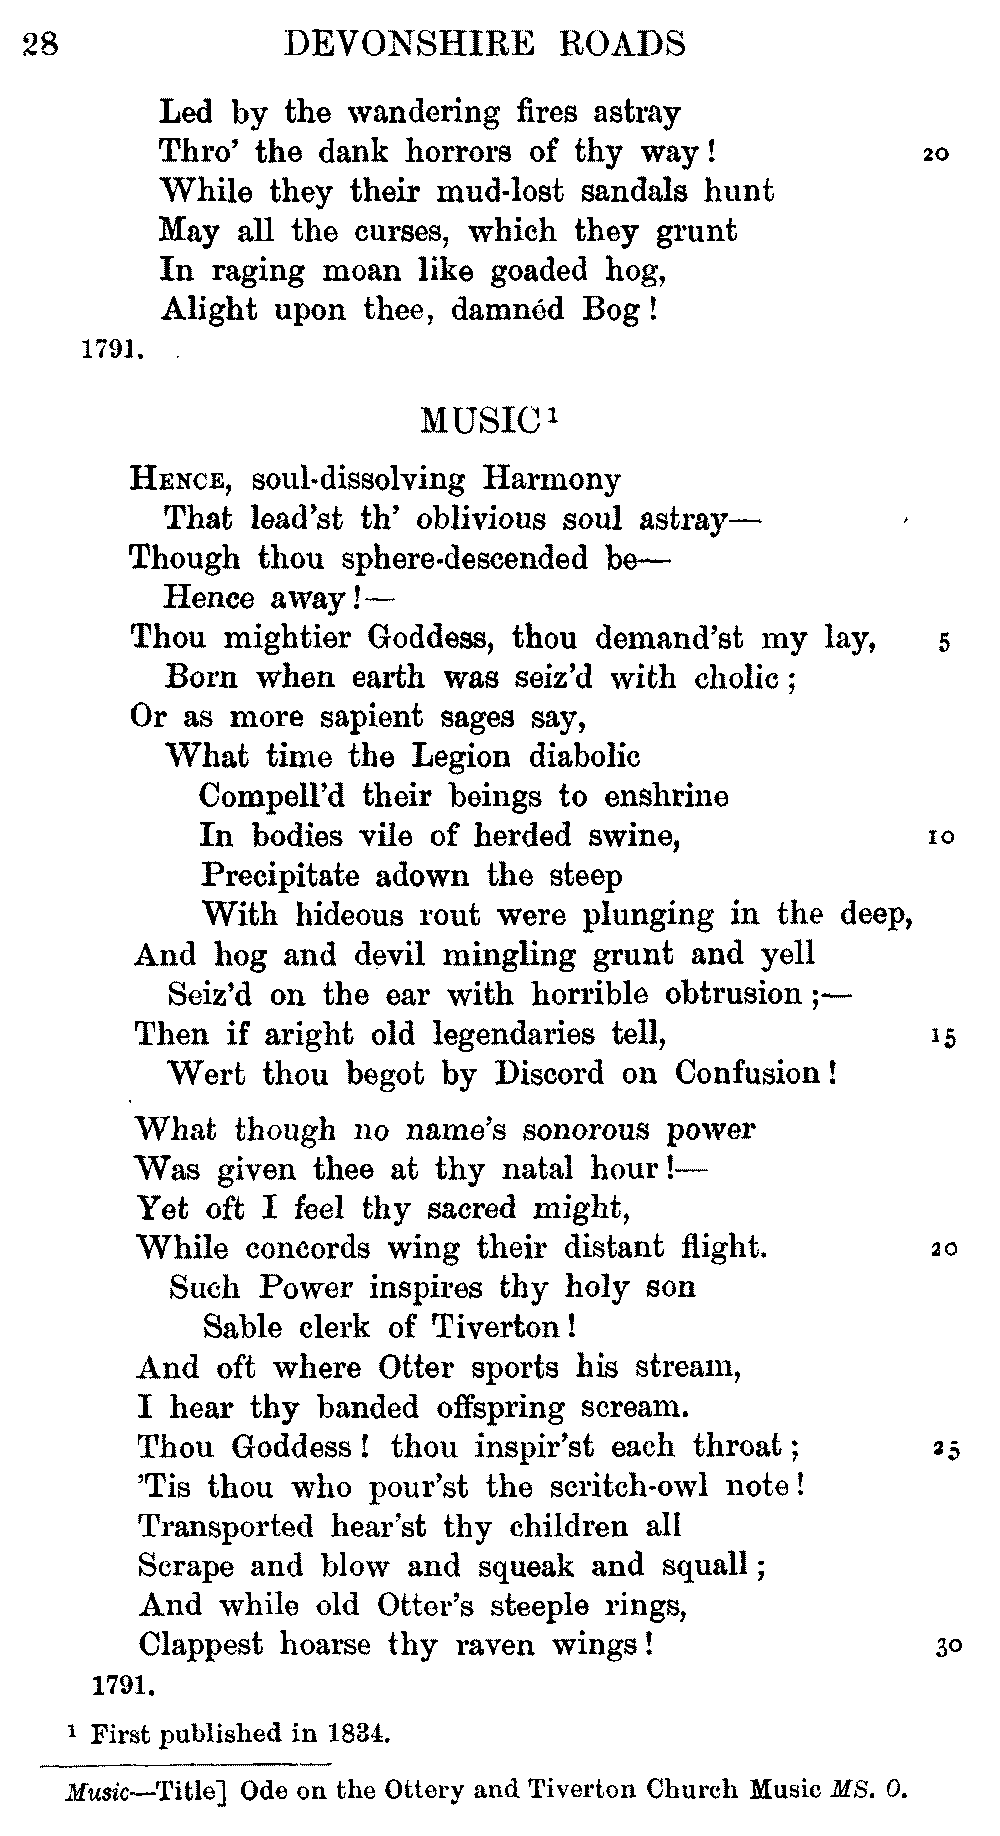 guilty or not guilty poem